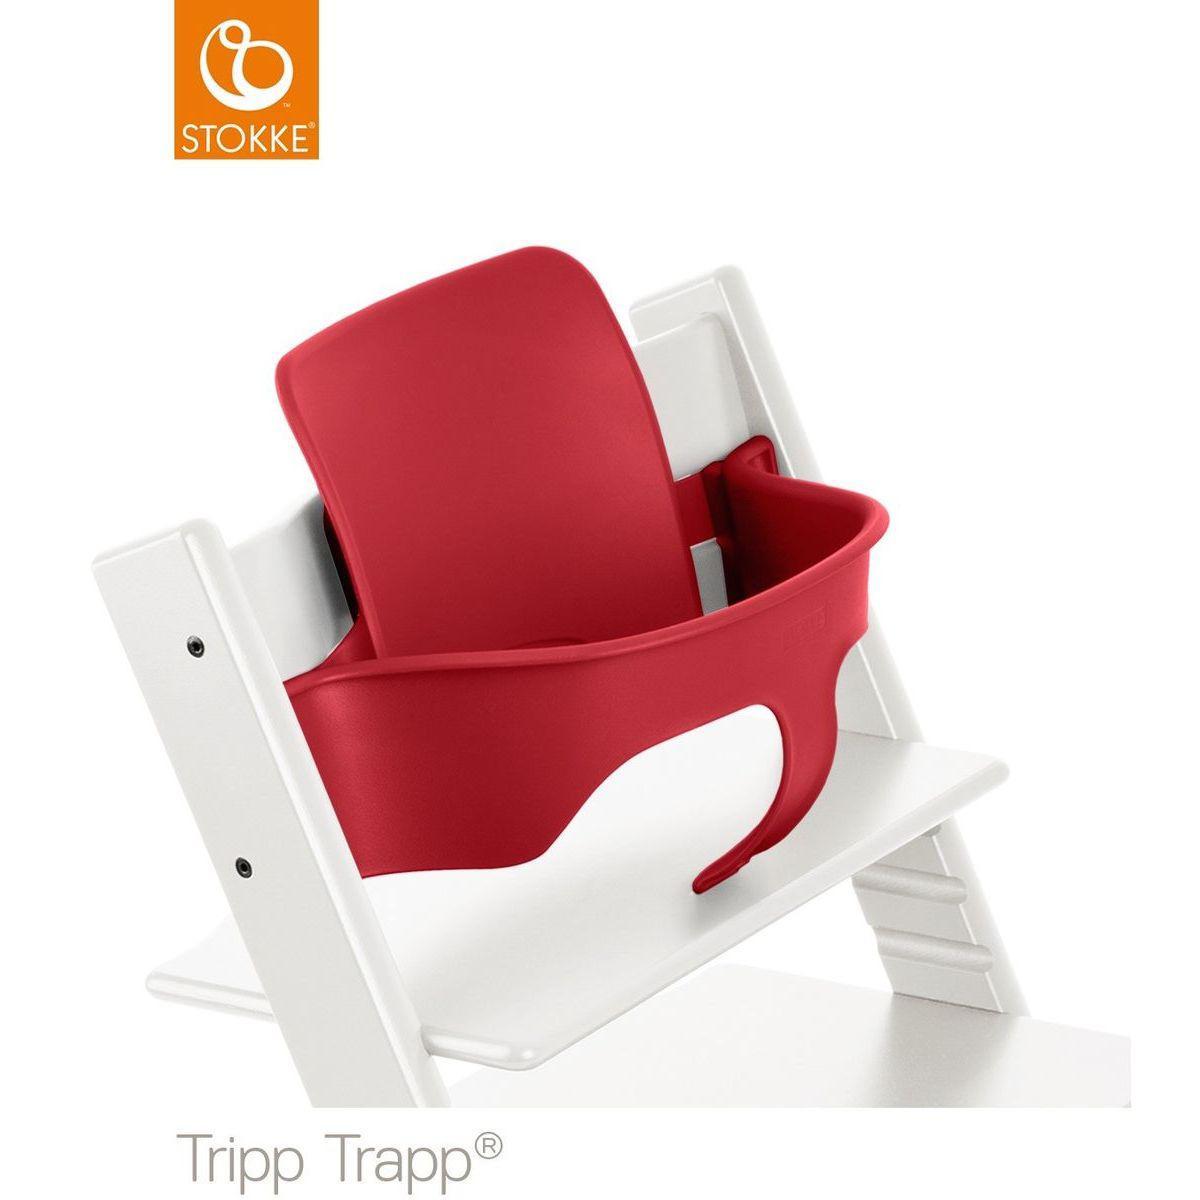 Baby Set Hochstuhl TRIPP TRAPP Stokke red